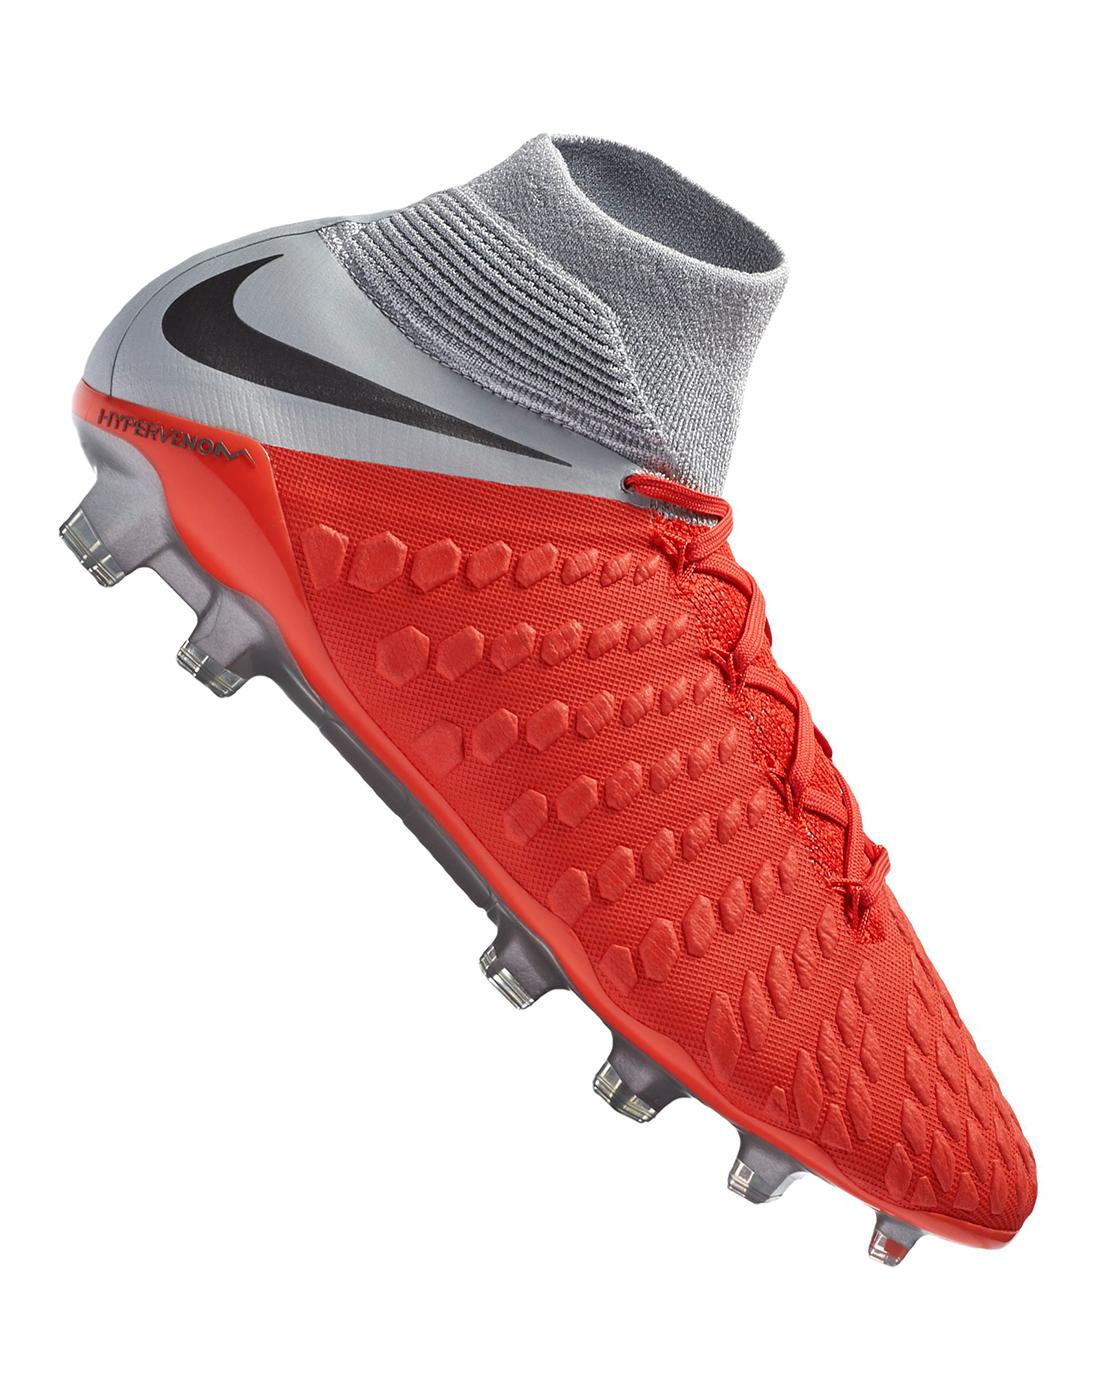 premium selection d7c4a af22f Nike Adult Hypervenom Phantom Elite Raised